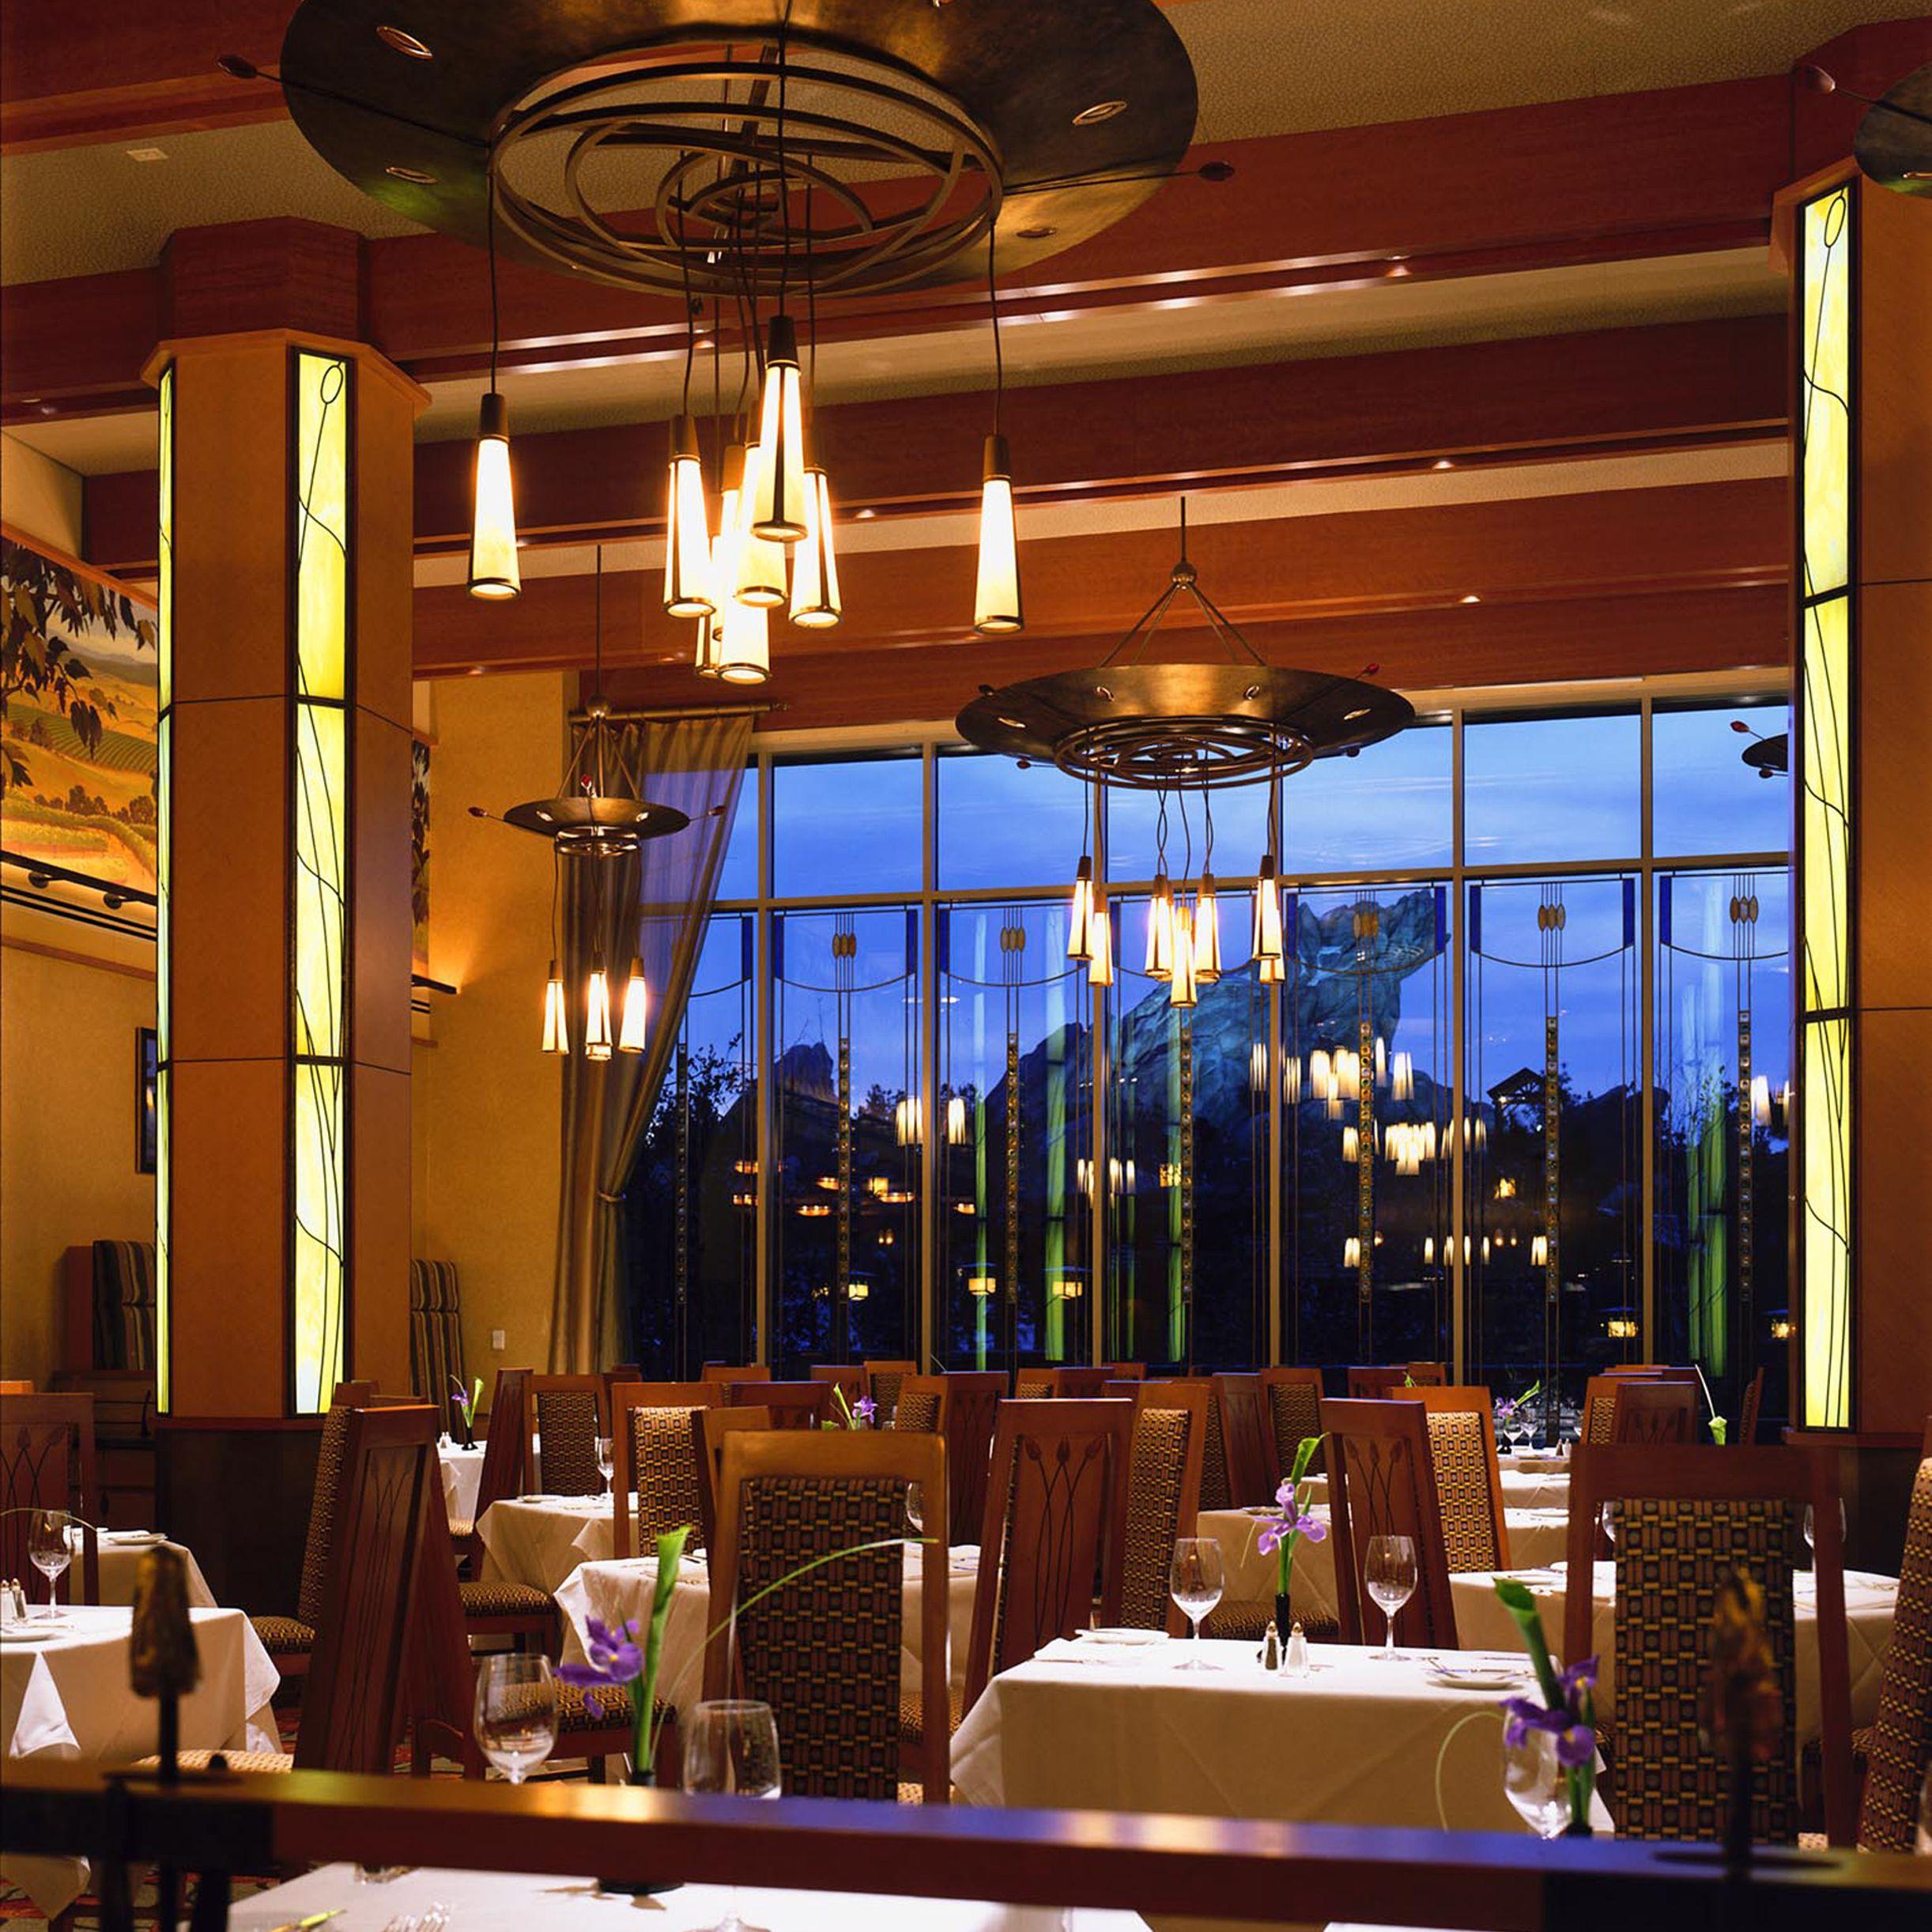 How To Make Disneyland Restaurant Reservations